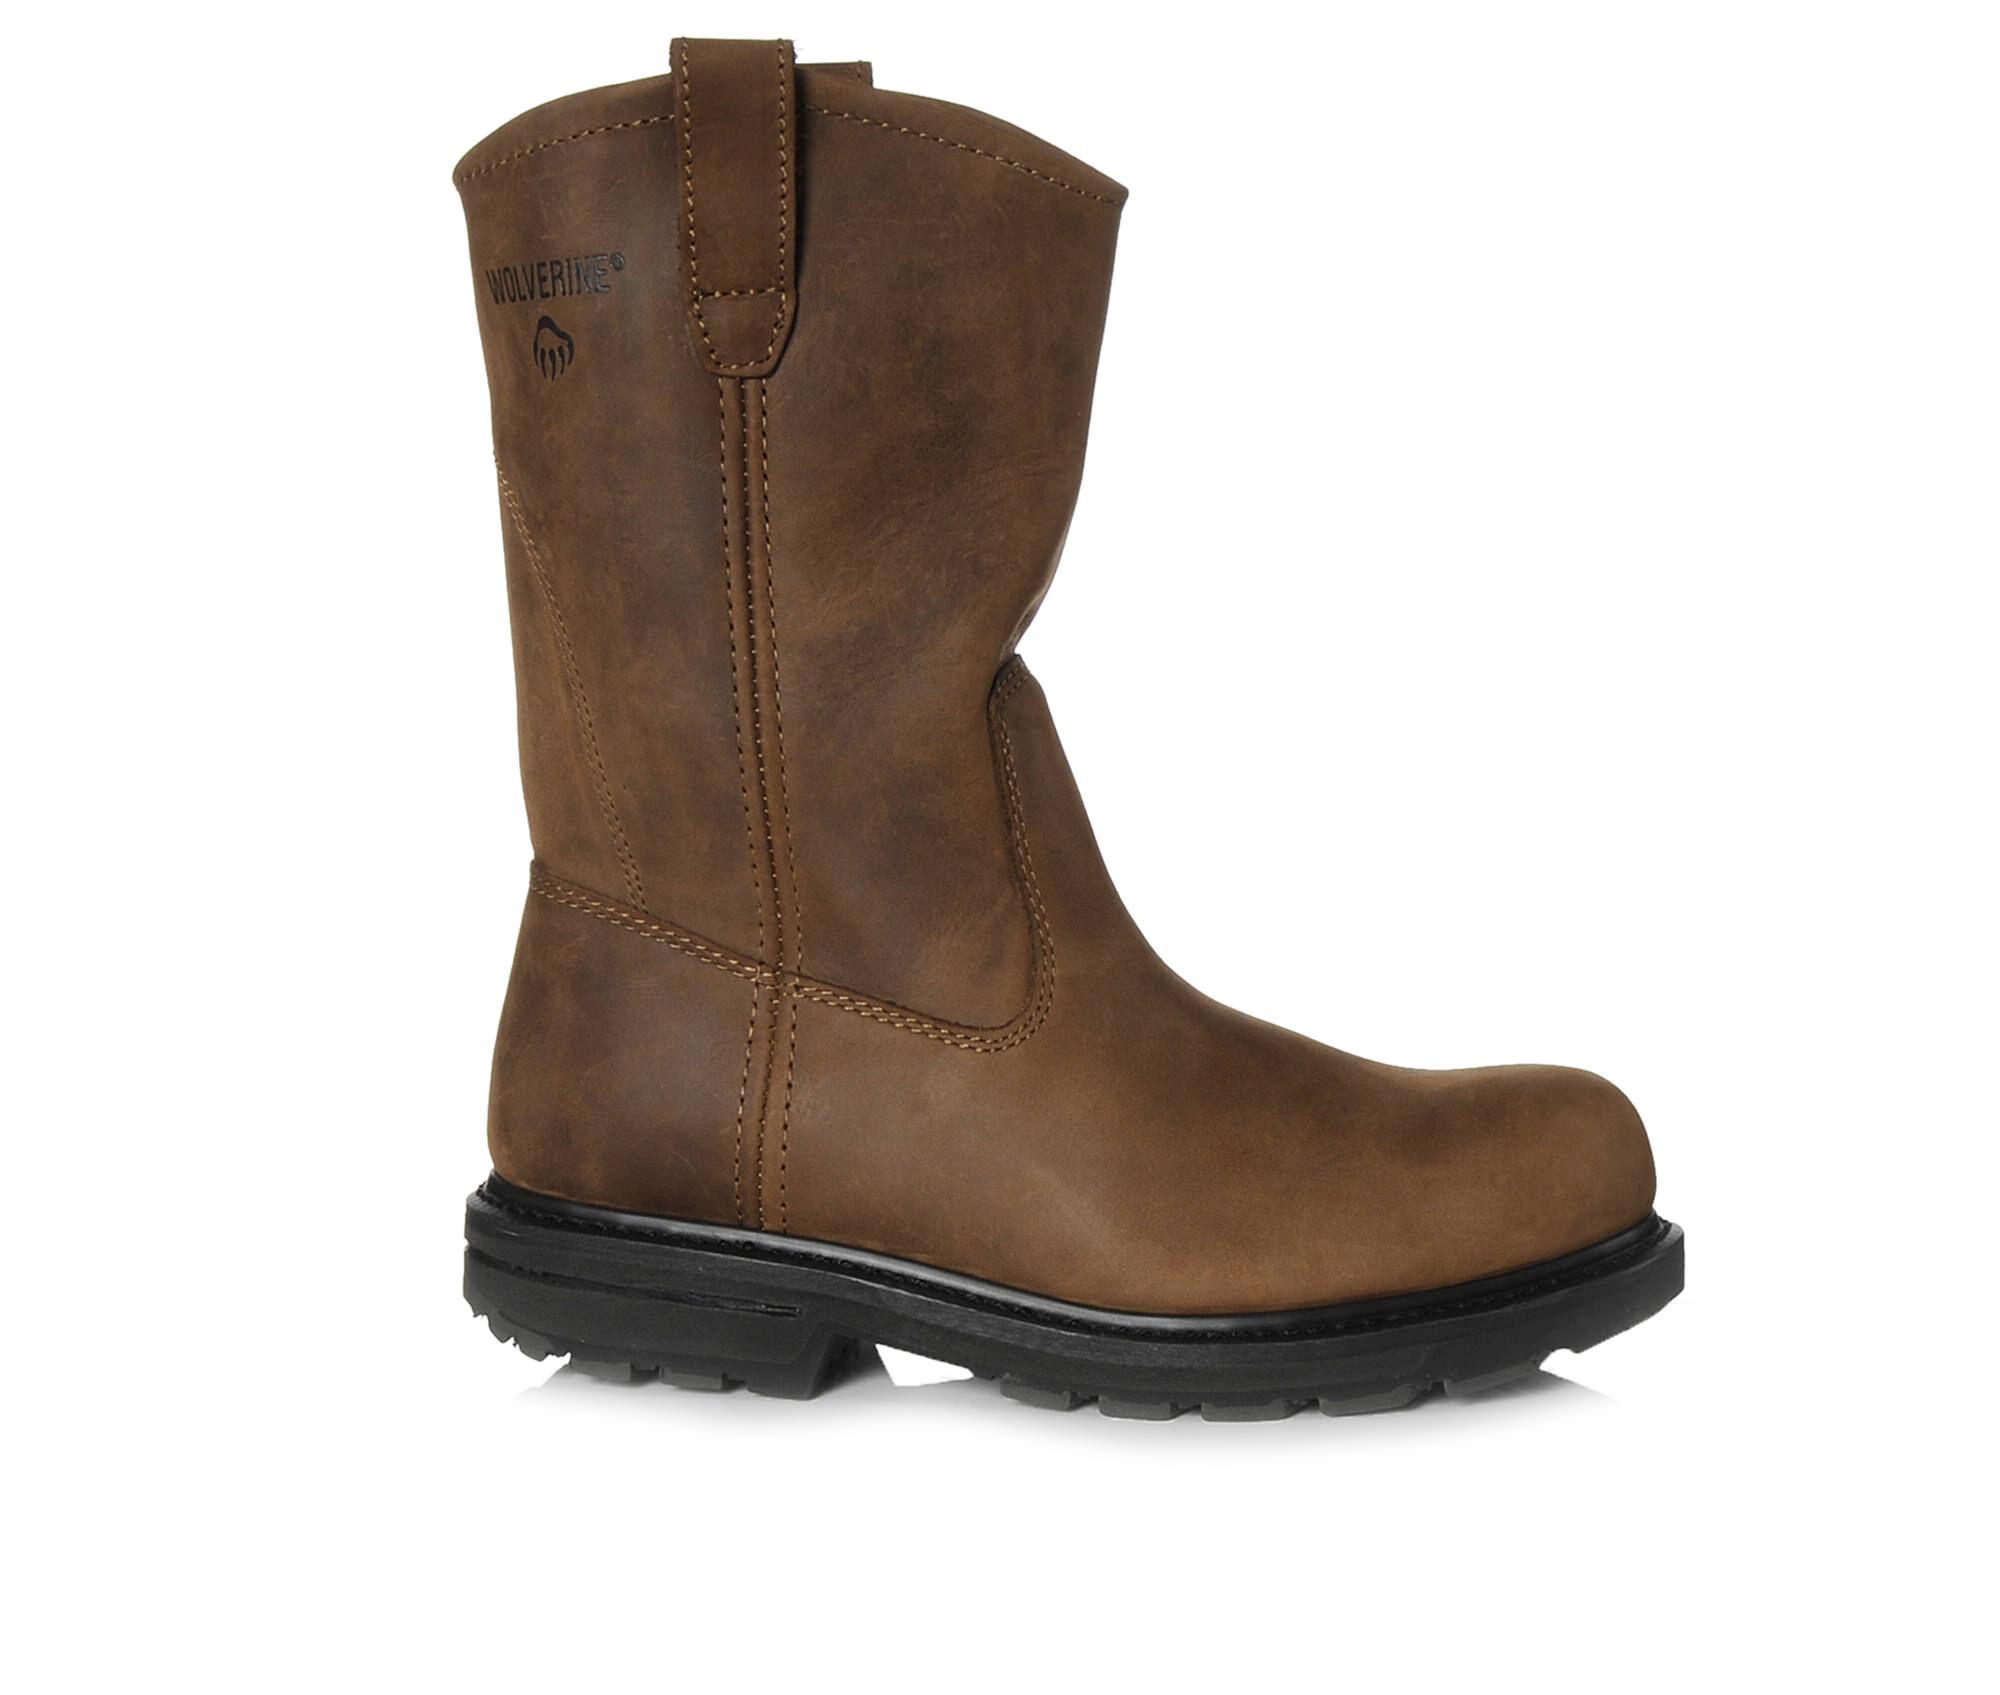 uk shoes_kd0993